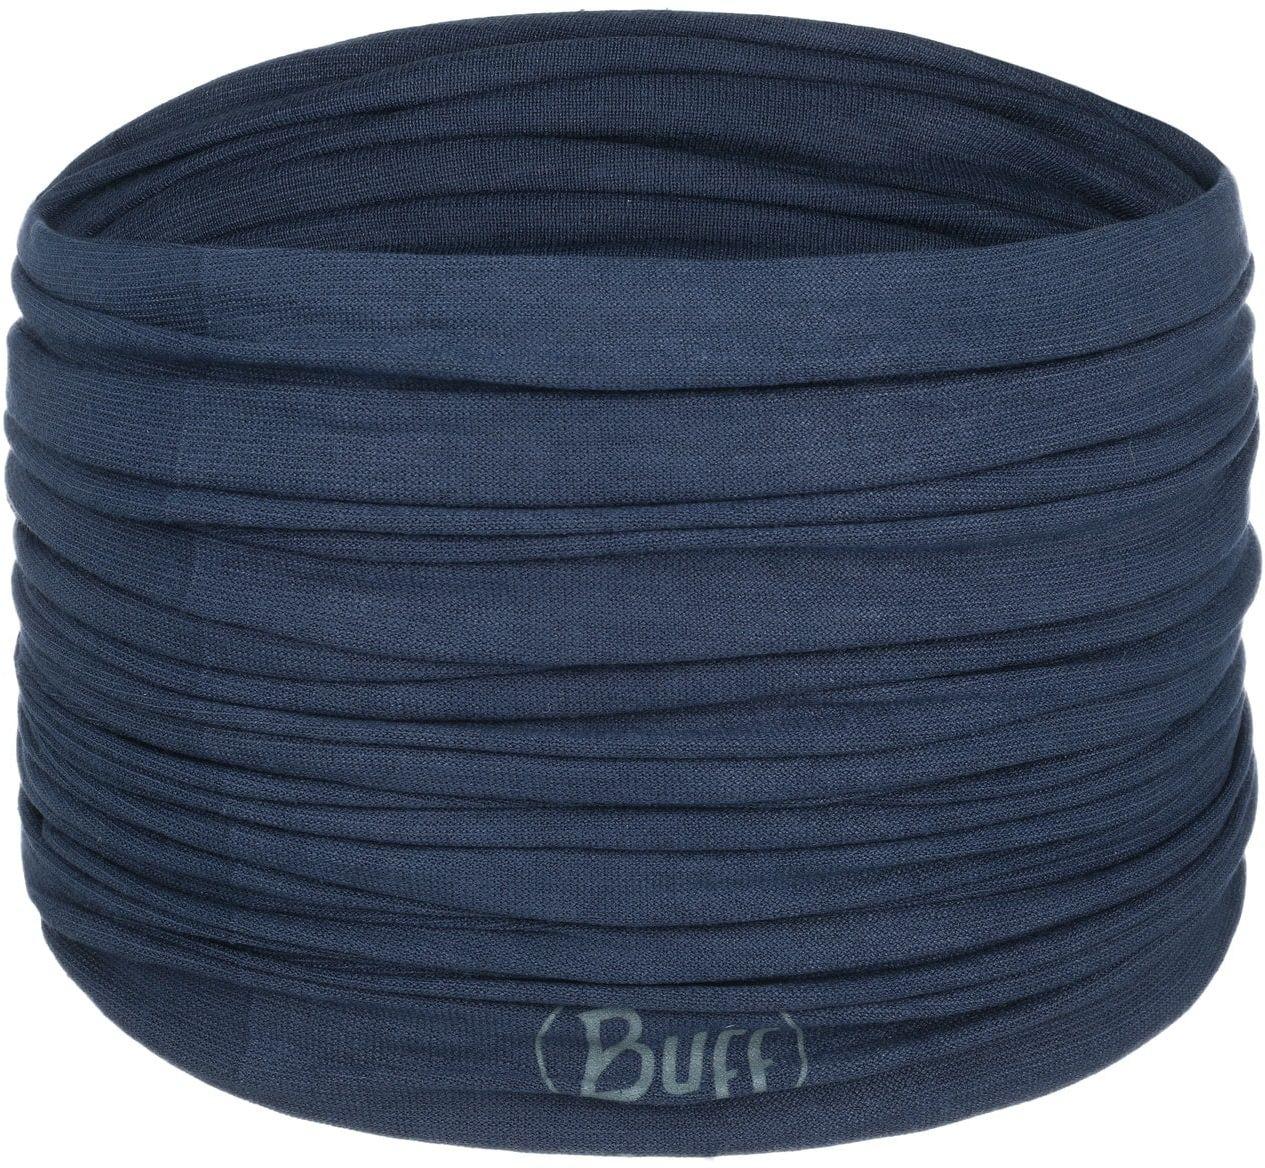 Solid Night Blue Multifunctional Bandana by BUFF, ciemnoniebieski, One Size